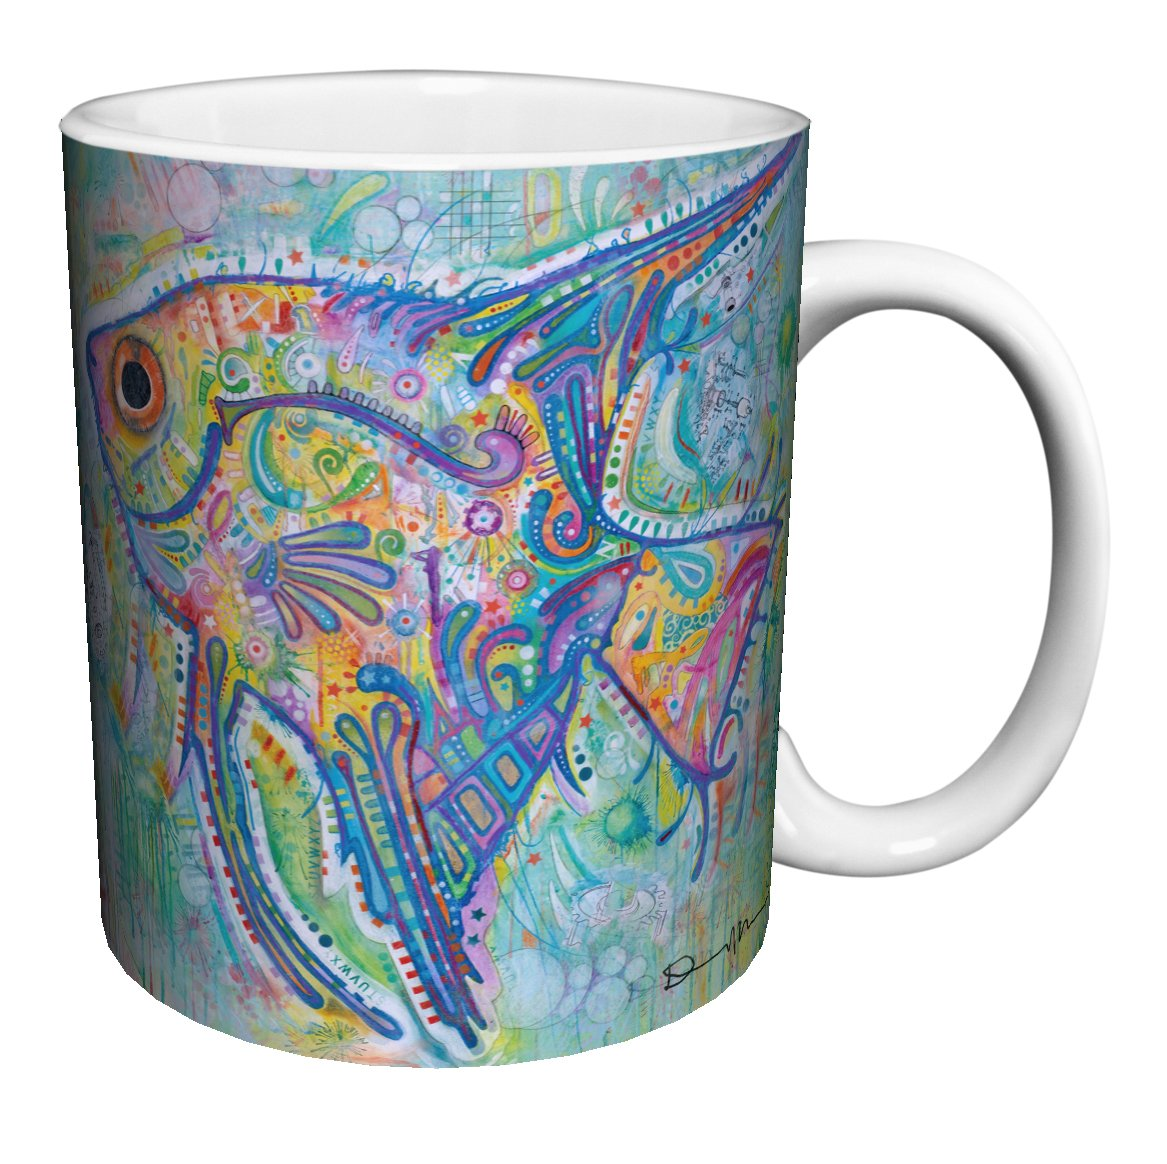 Dean Russo Fish Modern Animal Art Porcelain Gift Coffee (Tea, Cocoa) 11 Oz. Mug